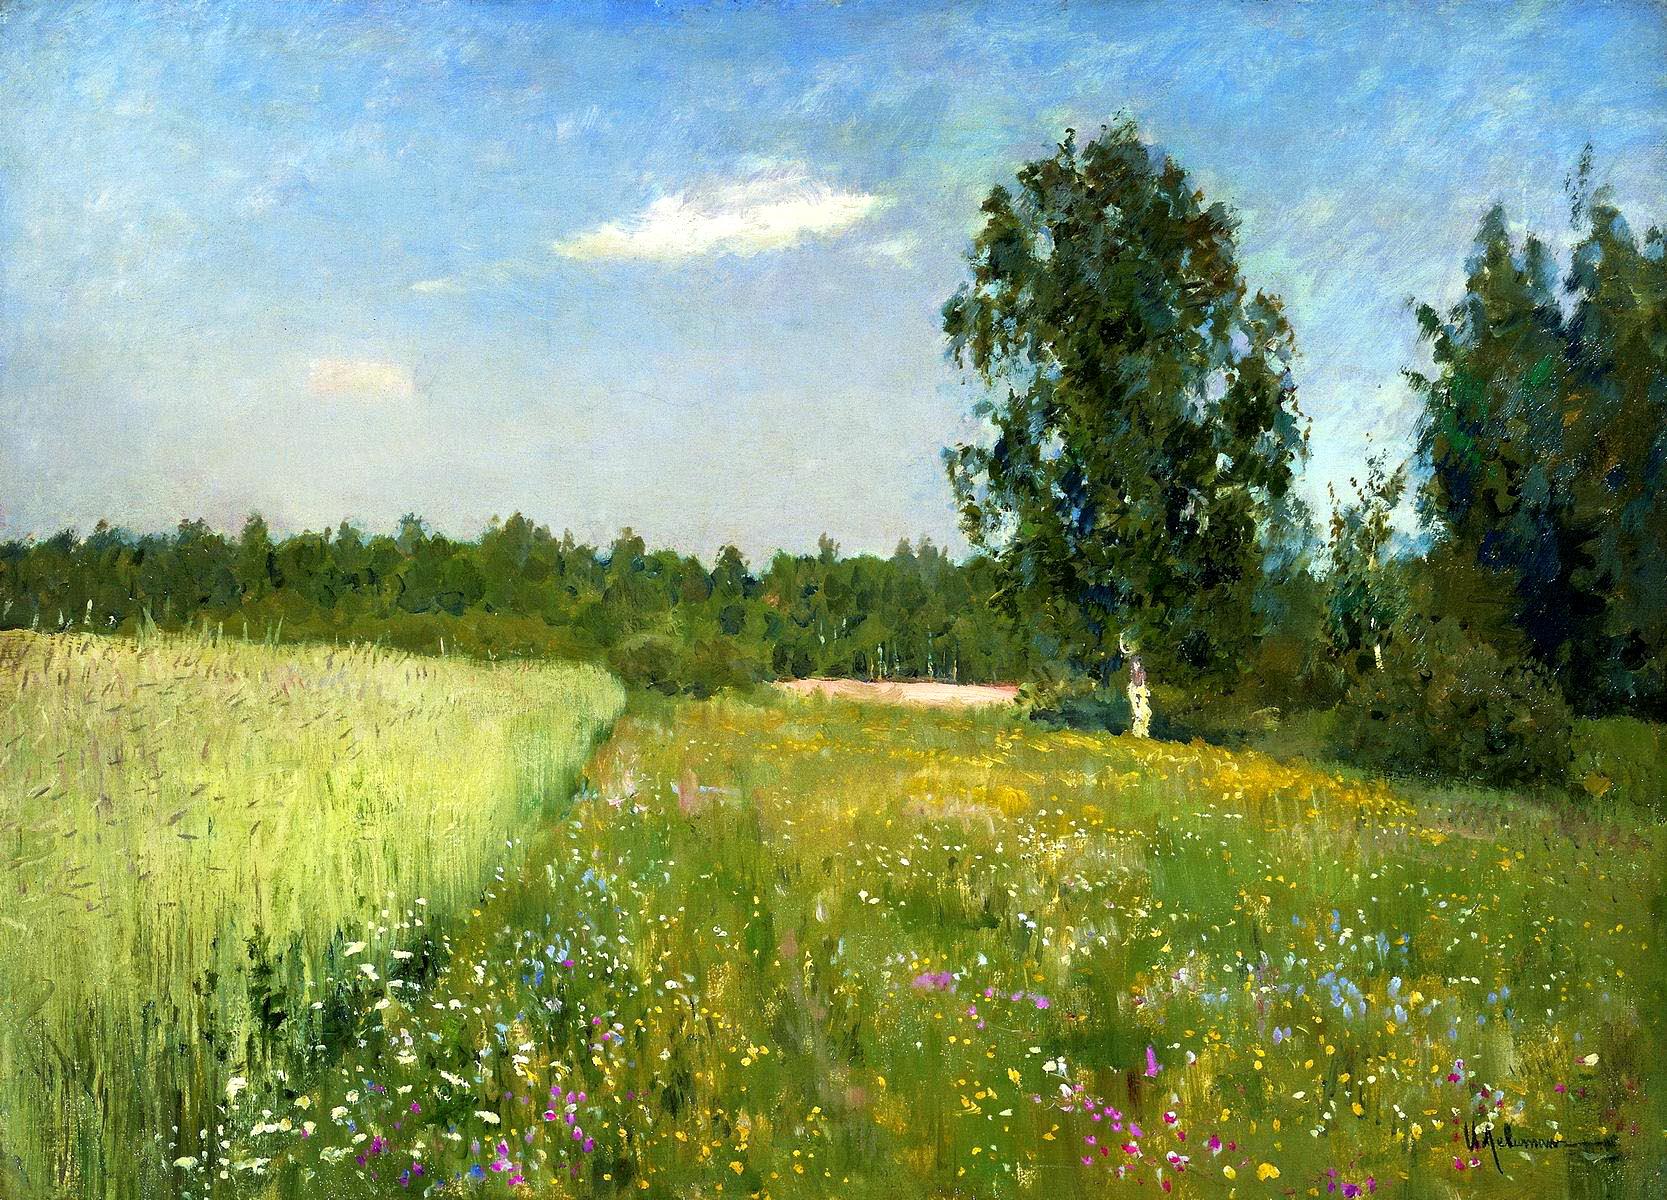 Картинка русского пейзажа